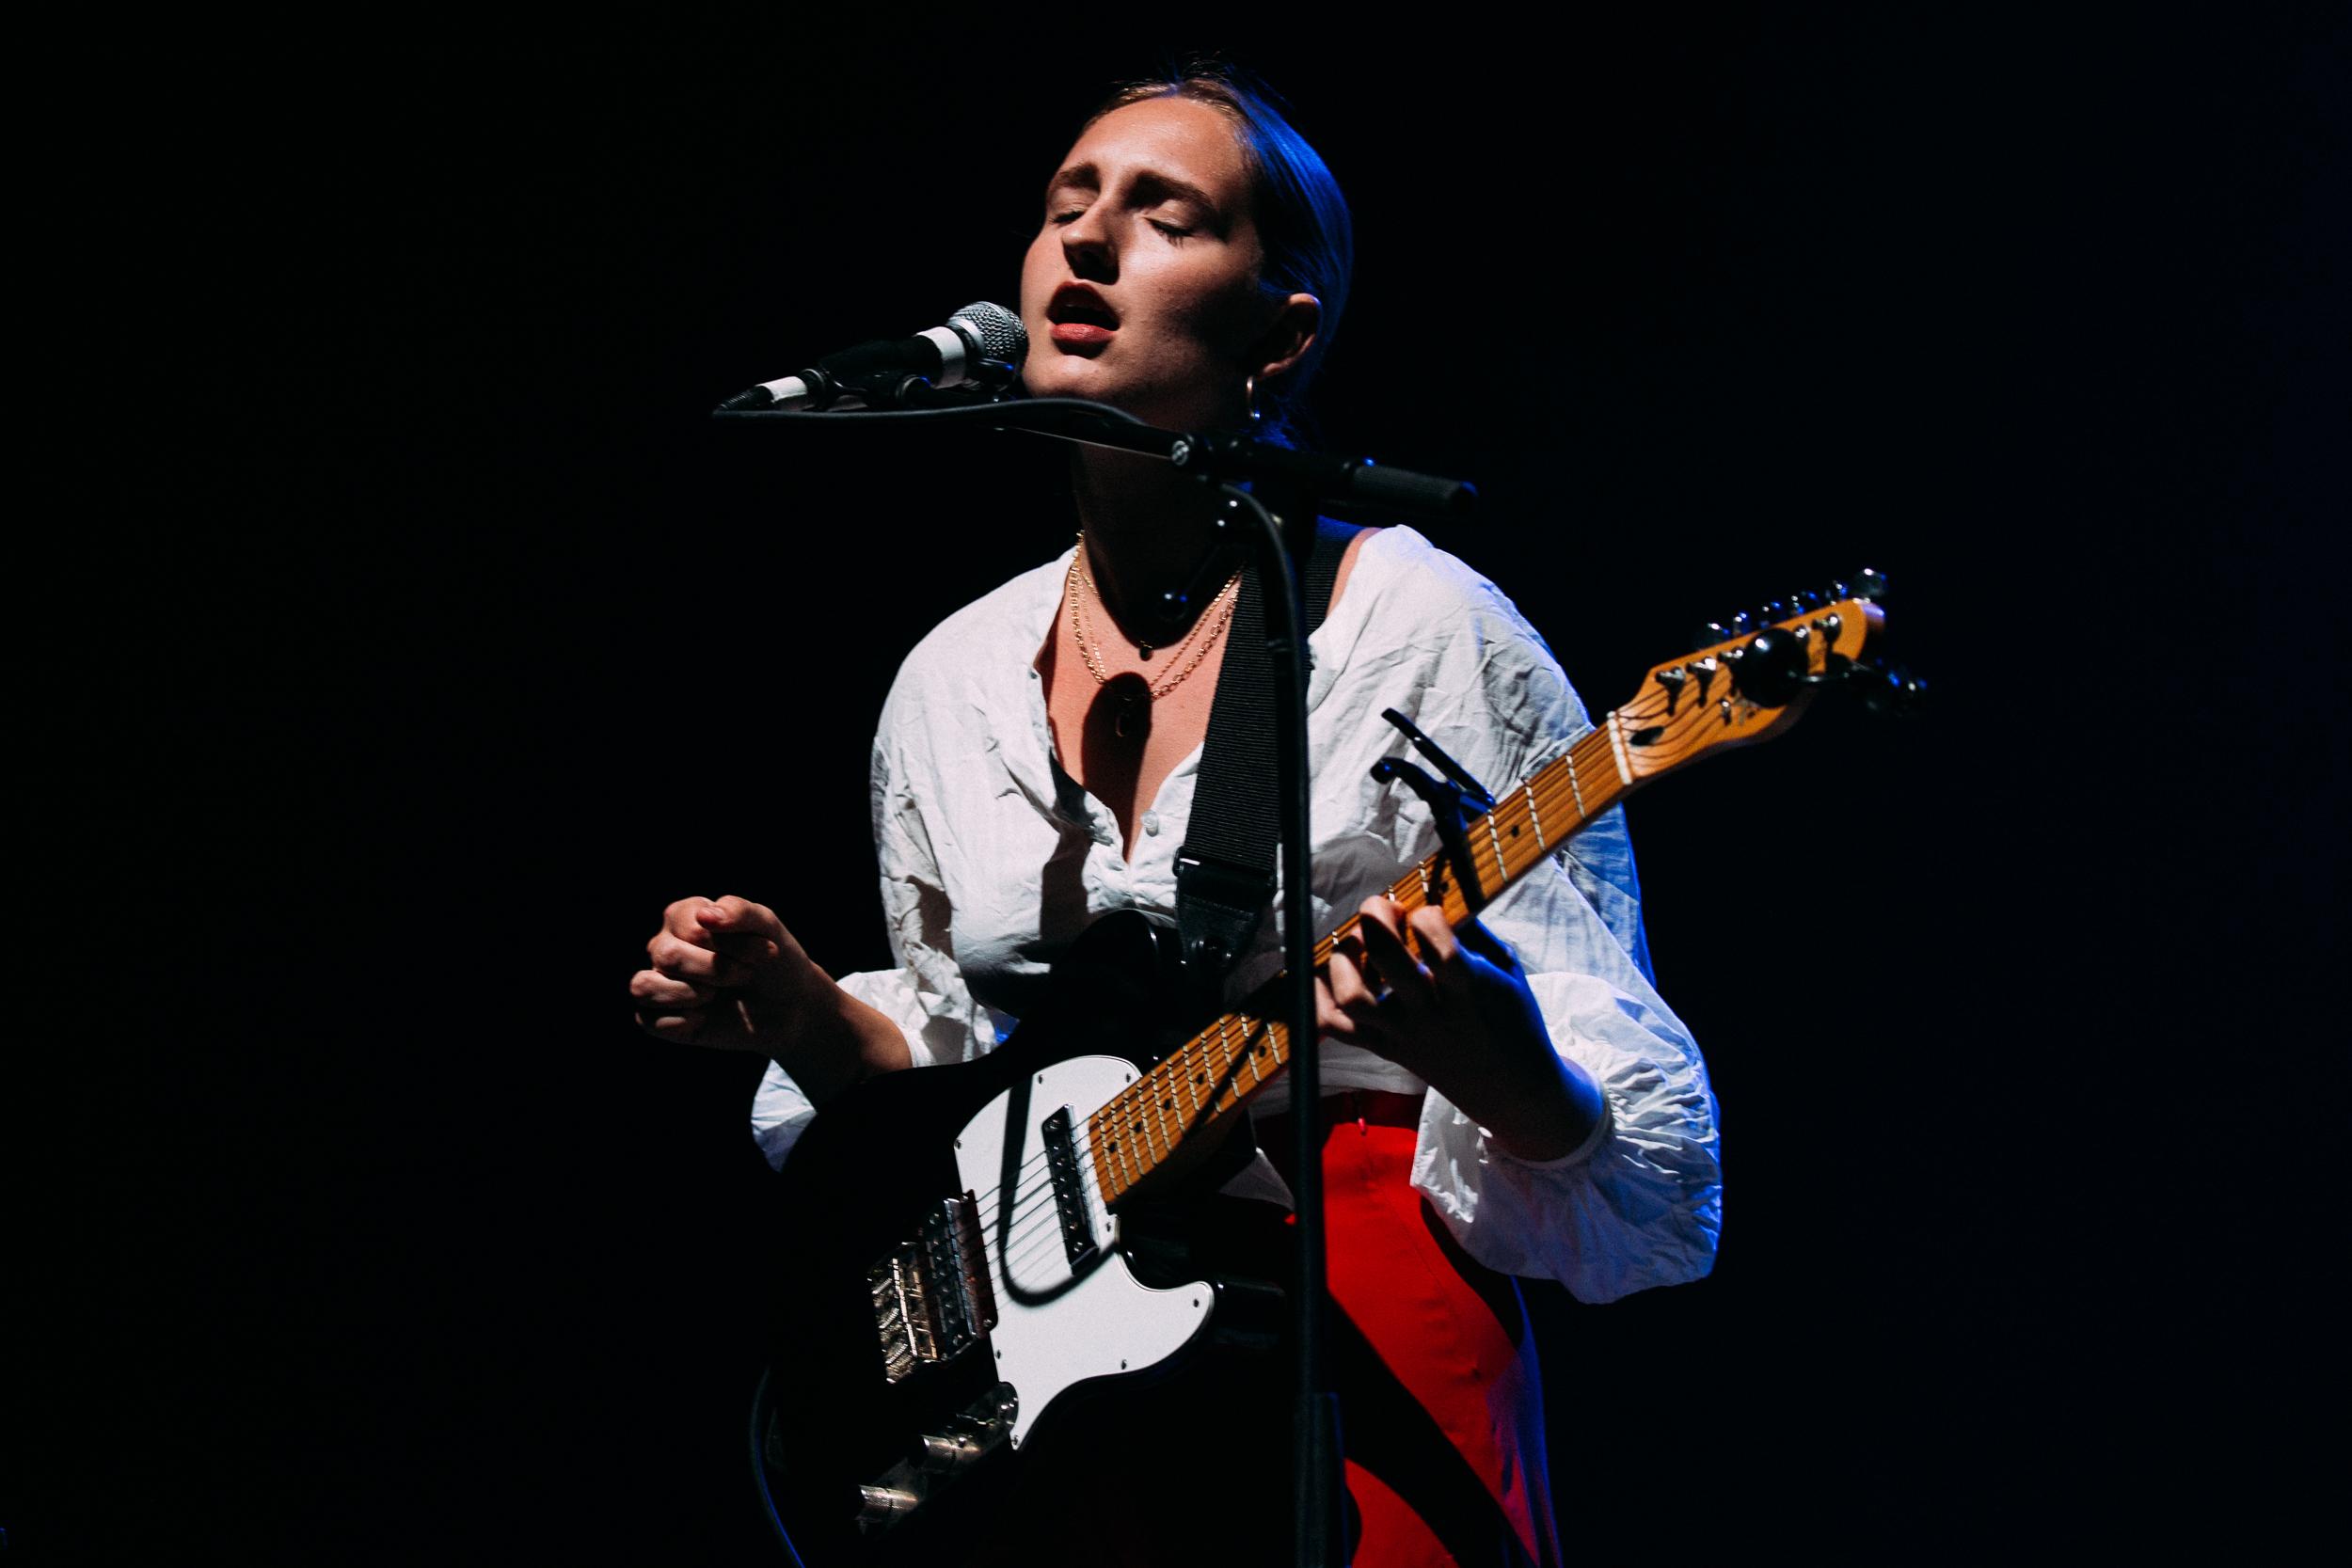 Madison Cunningham at The Anthem (Photo by Mauricio Castro /  @themauricio )